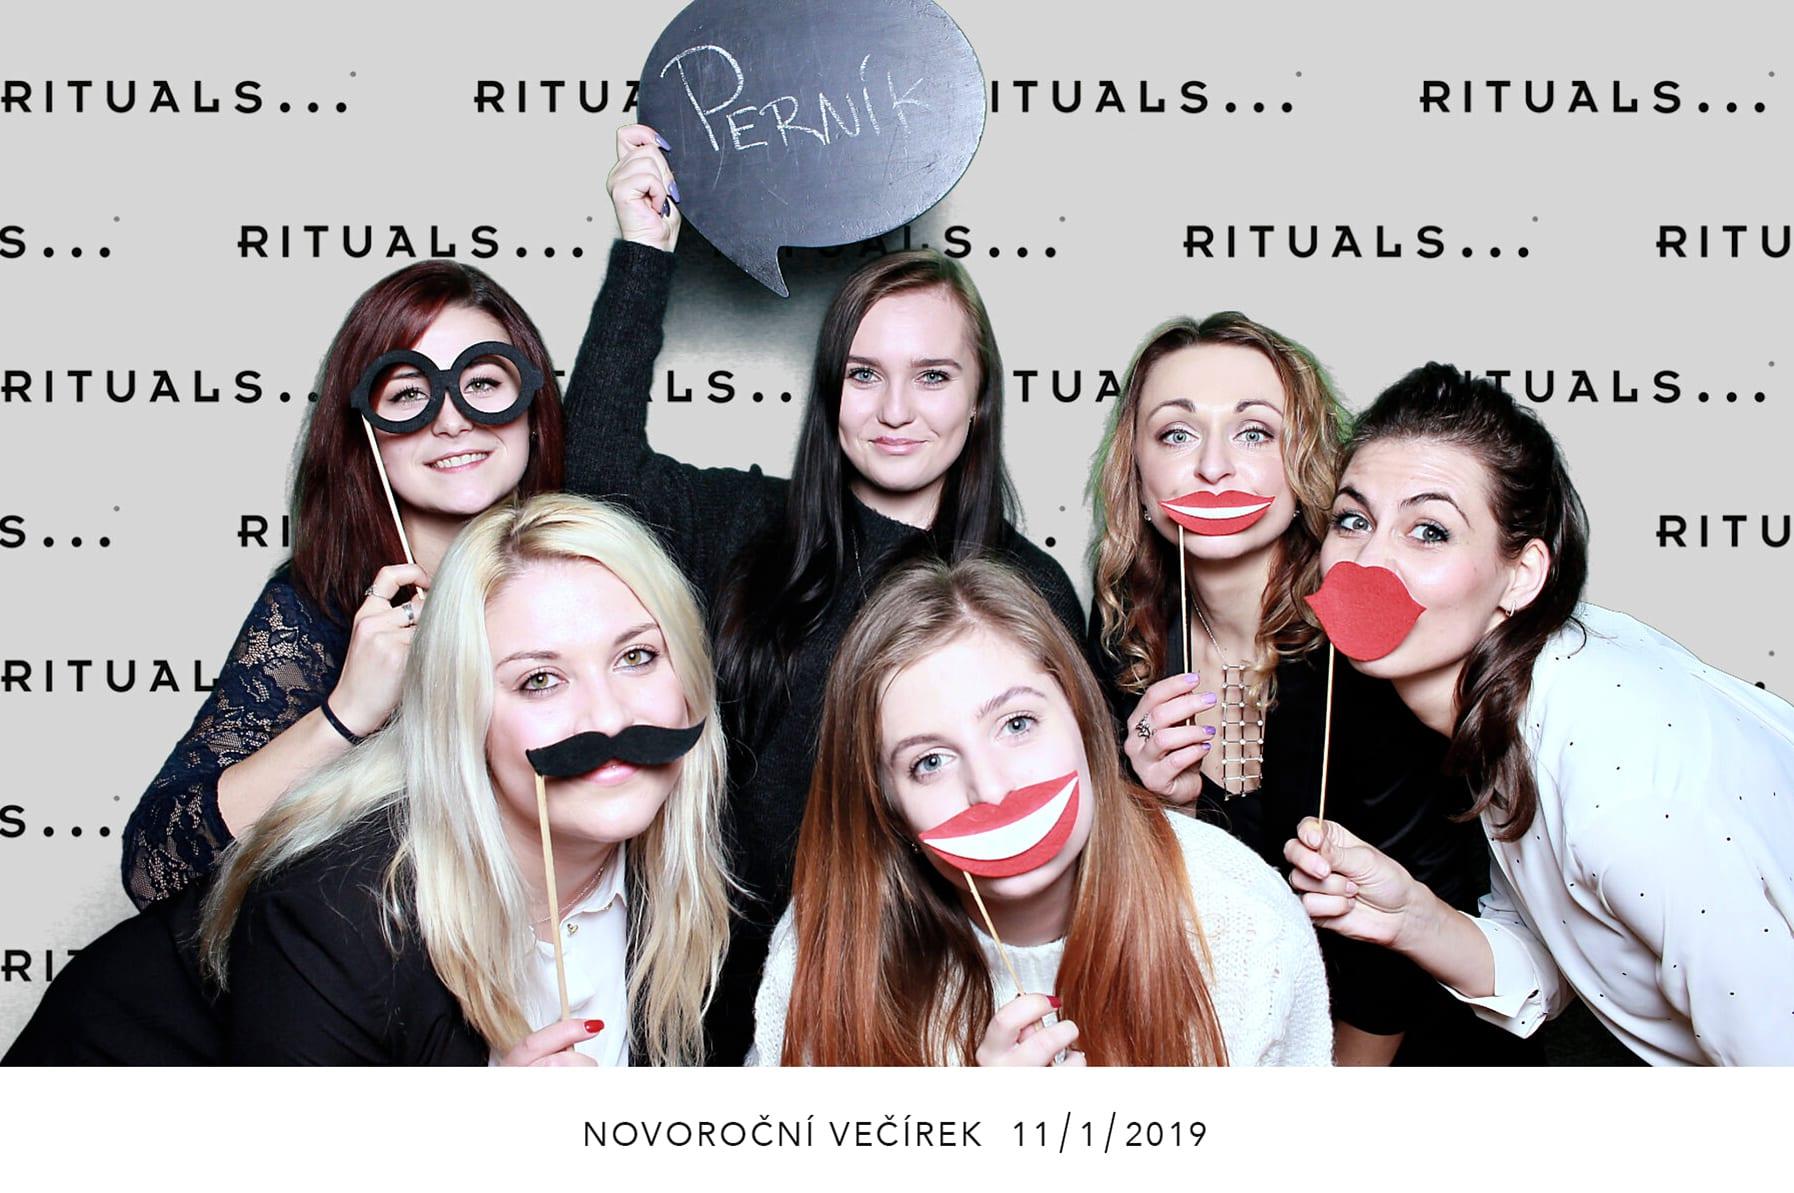 fotokoutek-rituals-11-1-2019-565595